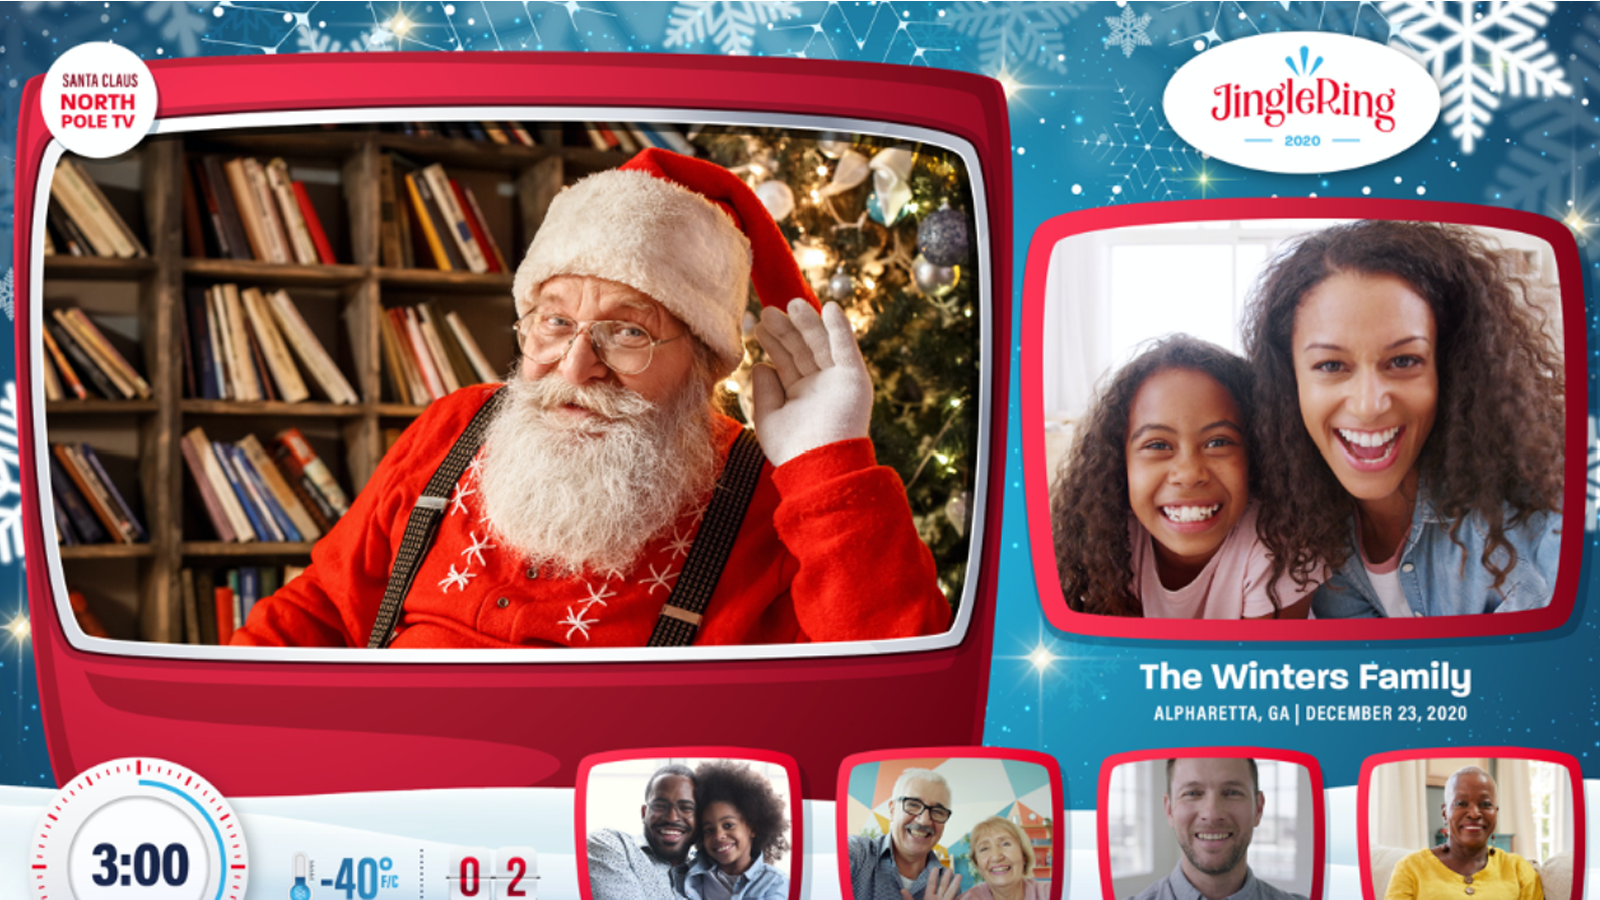 JingleRing Santa video call service